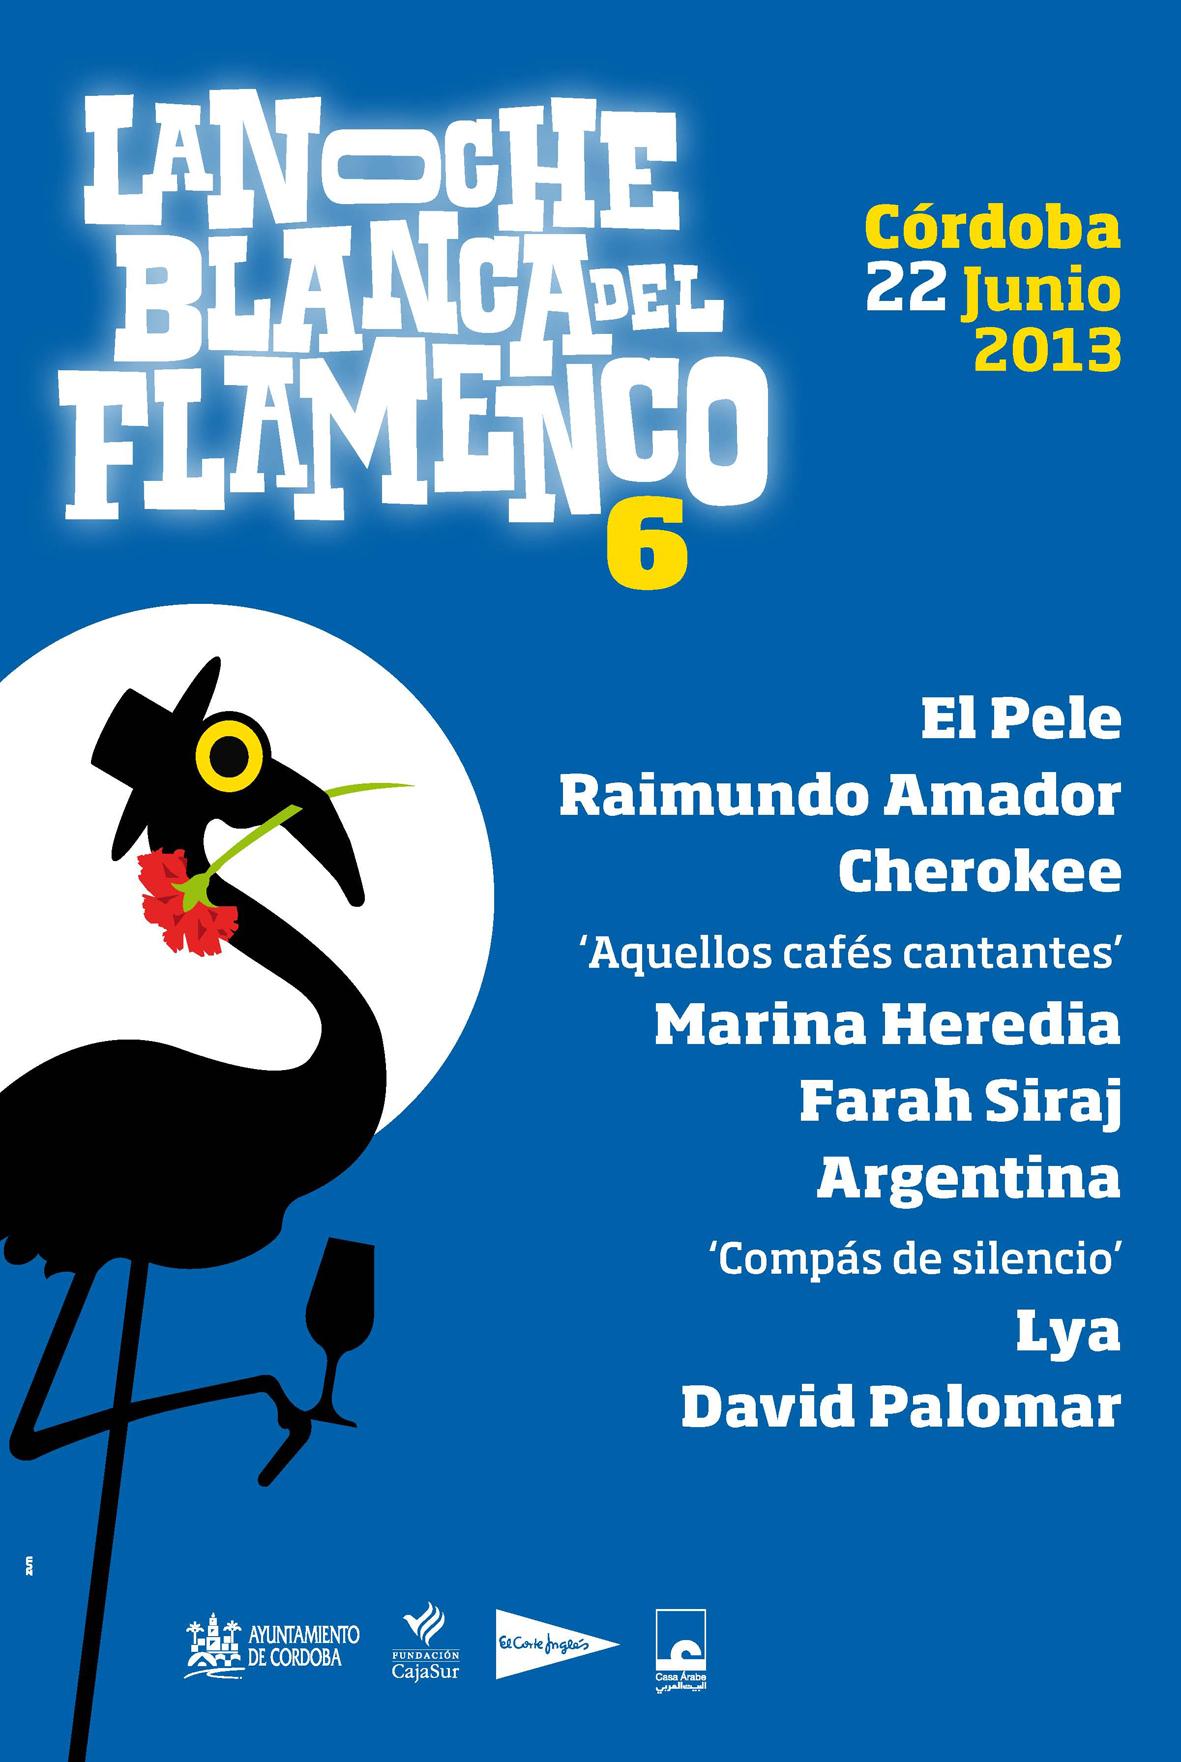 6ª Noche Blanca del Flamenco en Córdoba